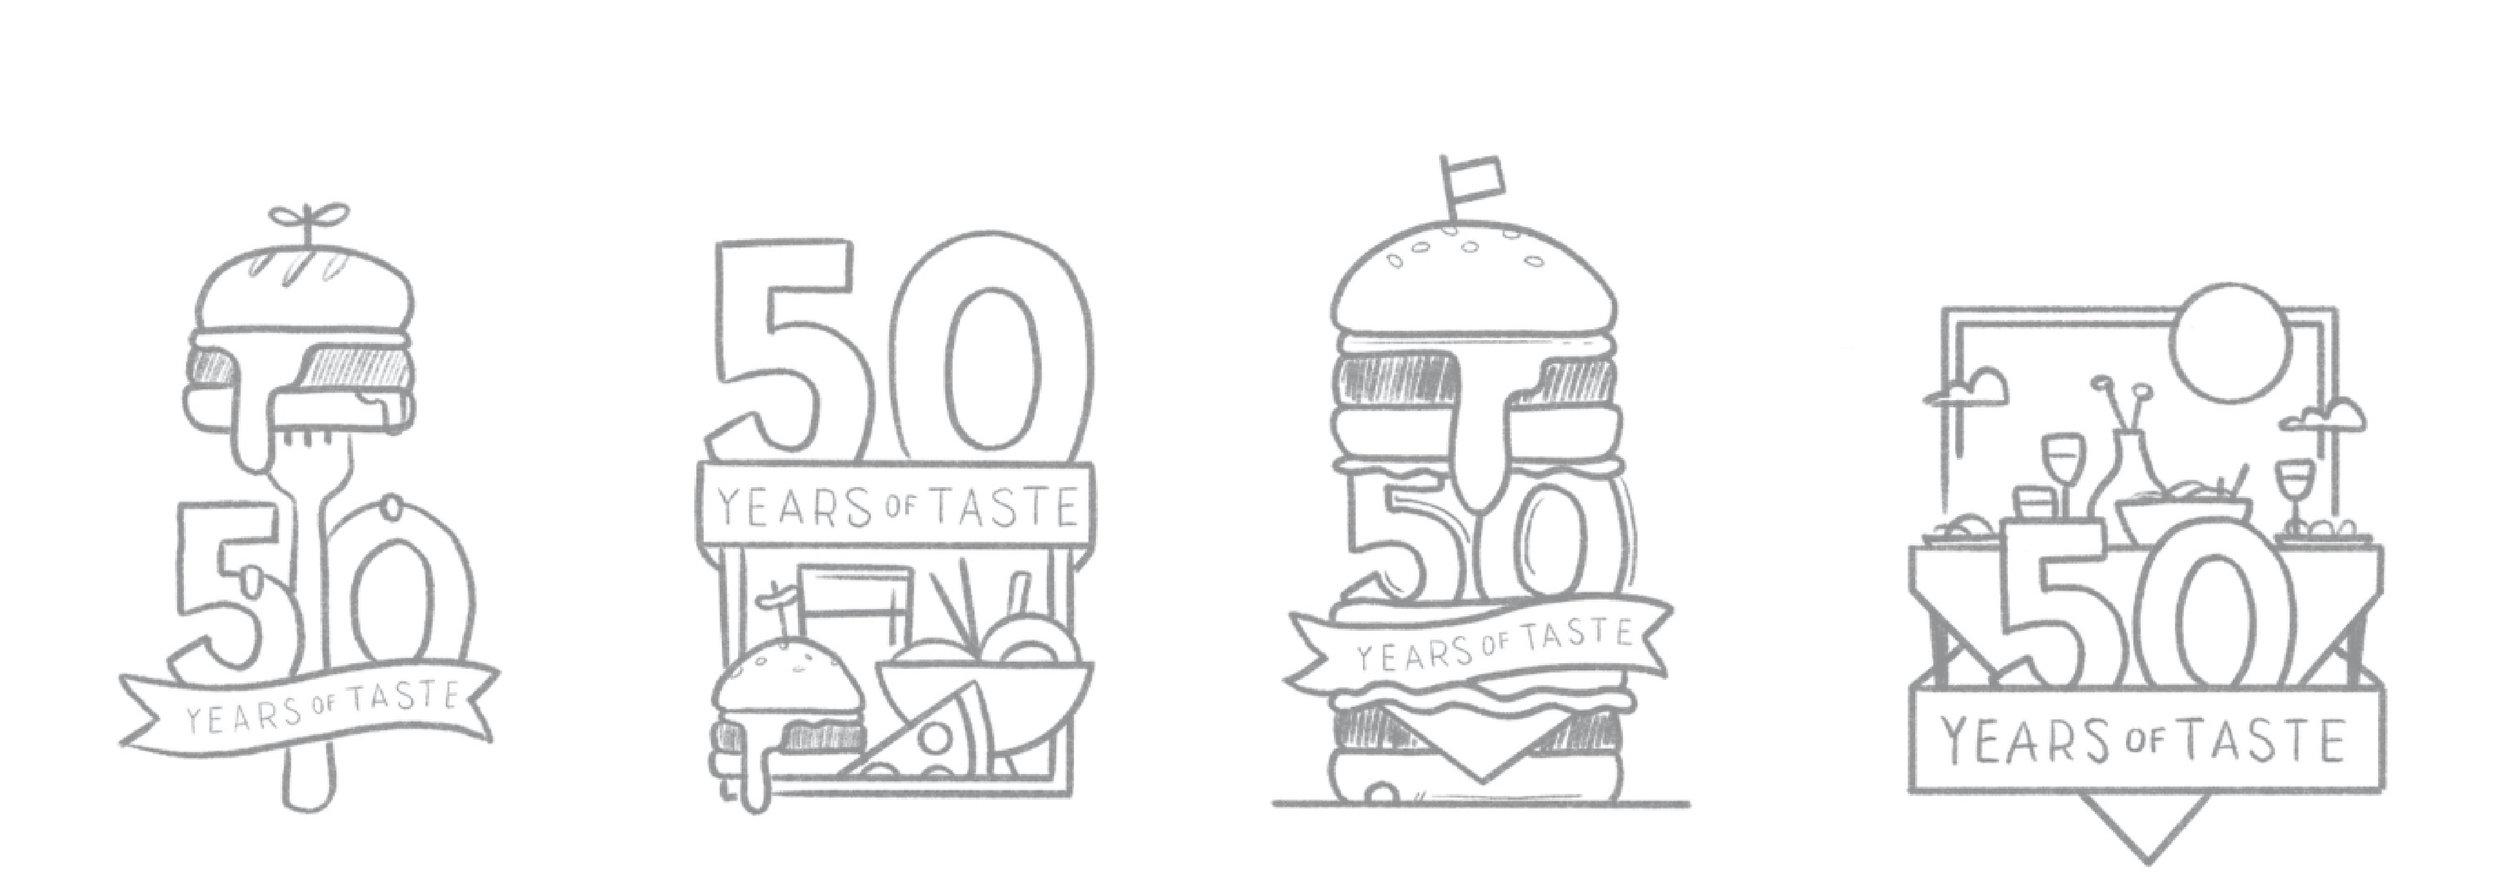 50Artboard 2 copy 2.jpg